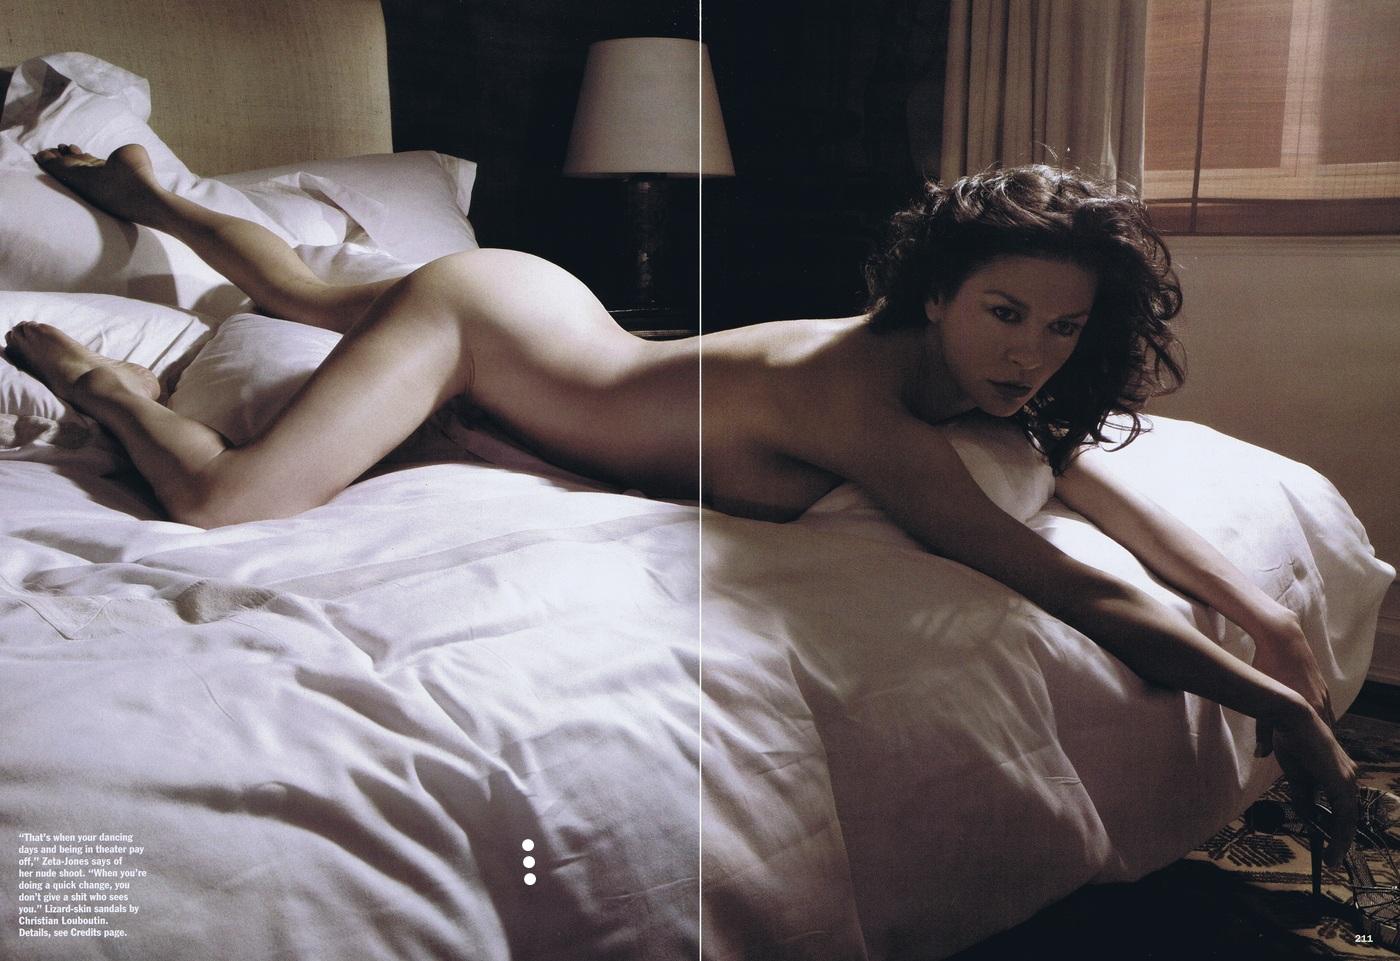 http://2.bp.blogspot.com/_vX2JZHFno7o/S81xUyvf7mI/AAAAAAAAYHo/2BZvPyqiM2A/s1600/Catherine+Zeta-Jones-2.jpg